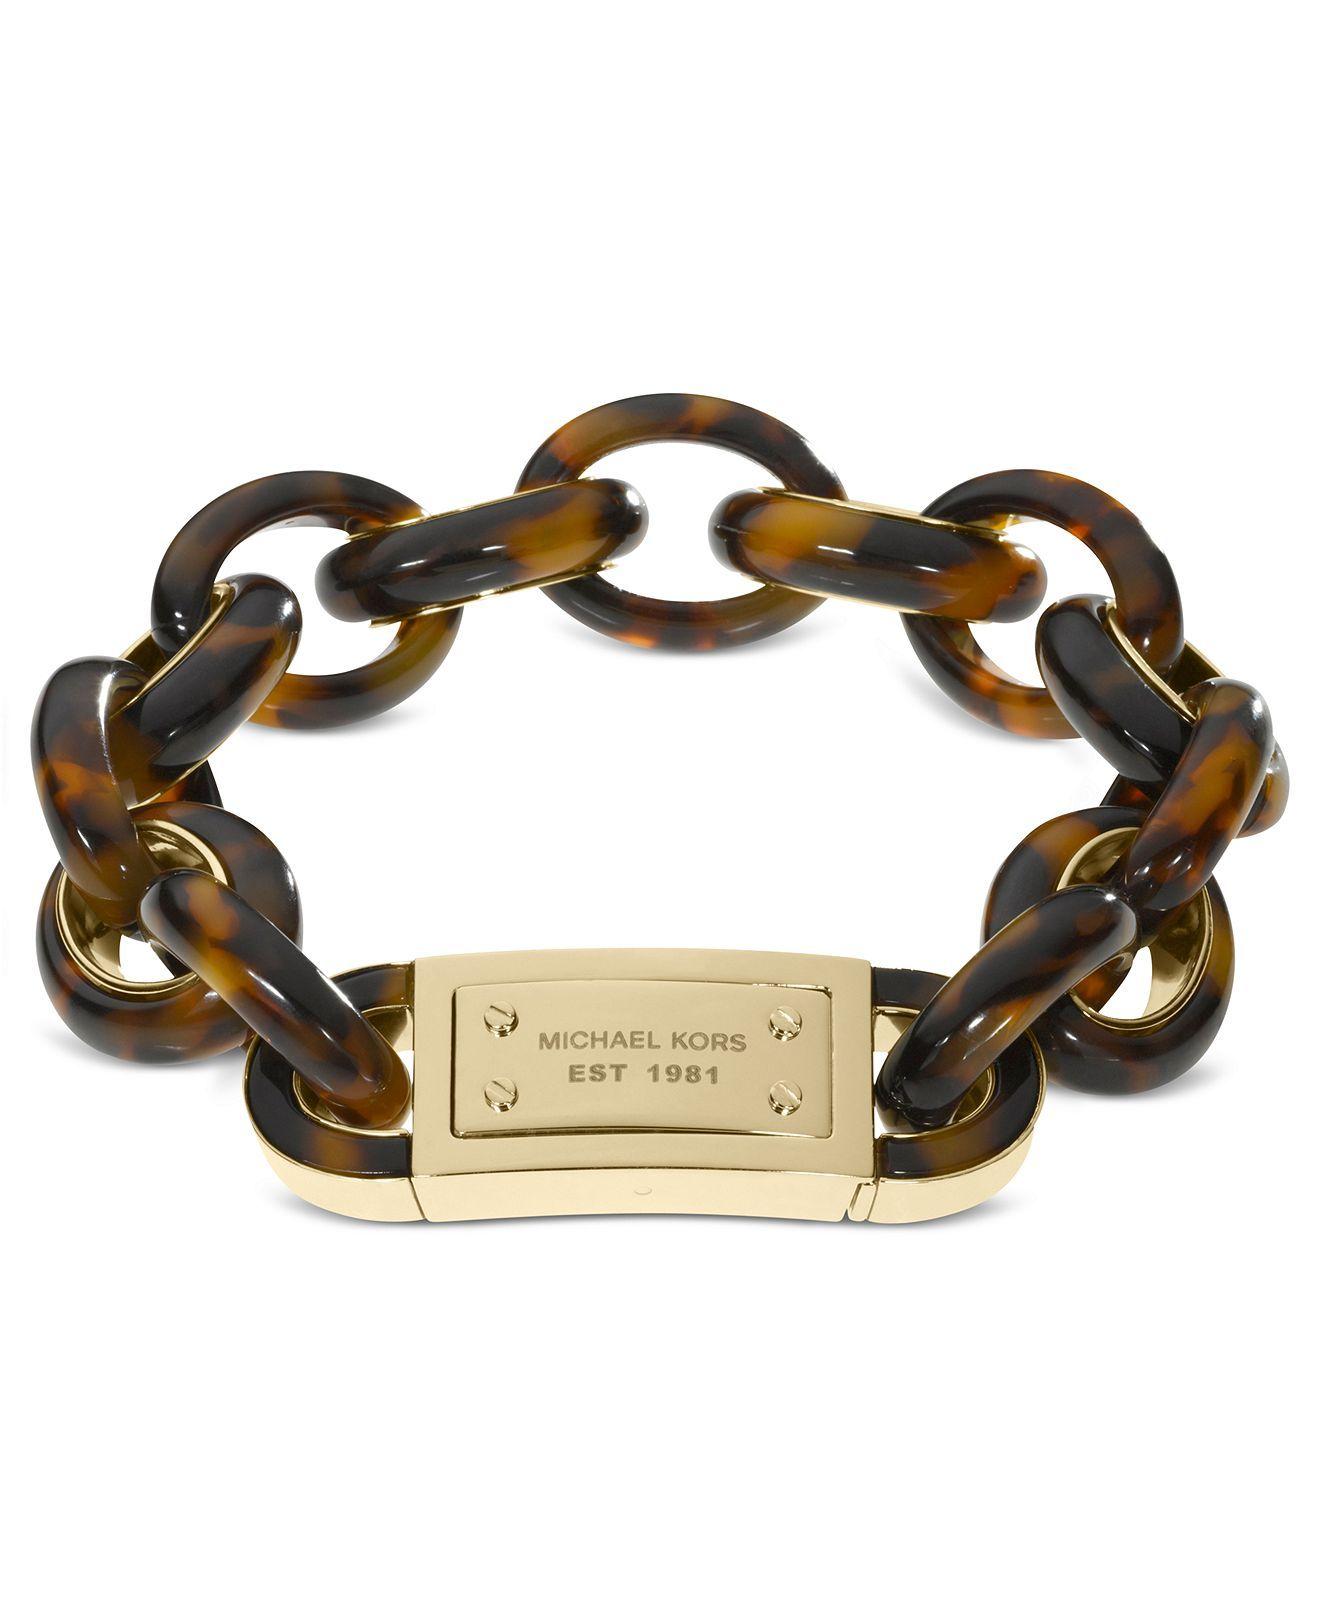 78e7d0c324571 Michael Kors Bracelet, Gold Tone Tortoise Link Bracelet - - Macy's ...